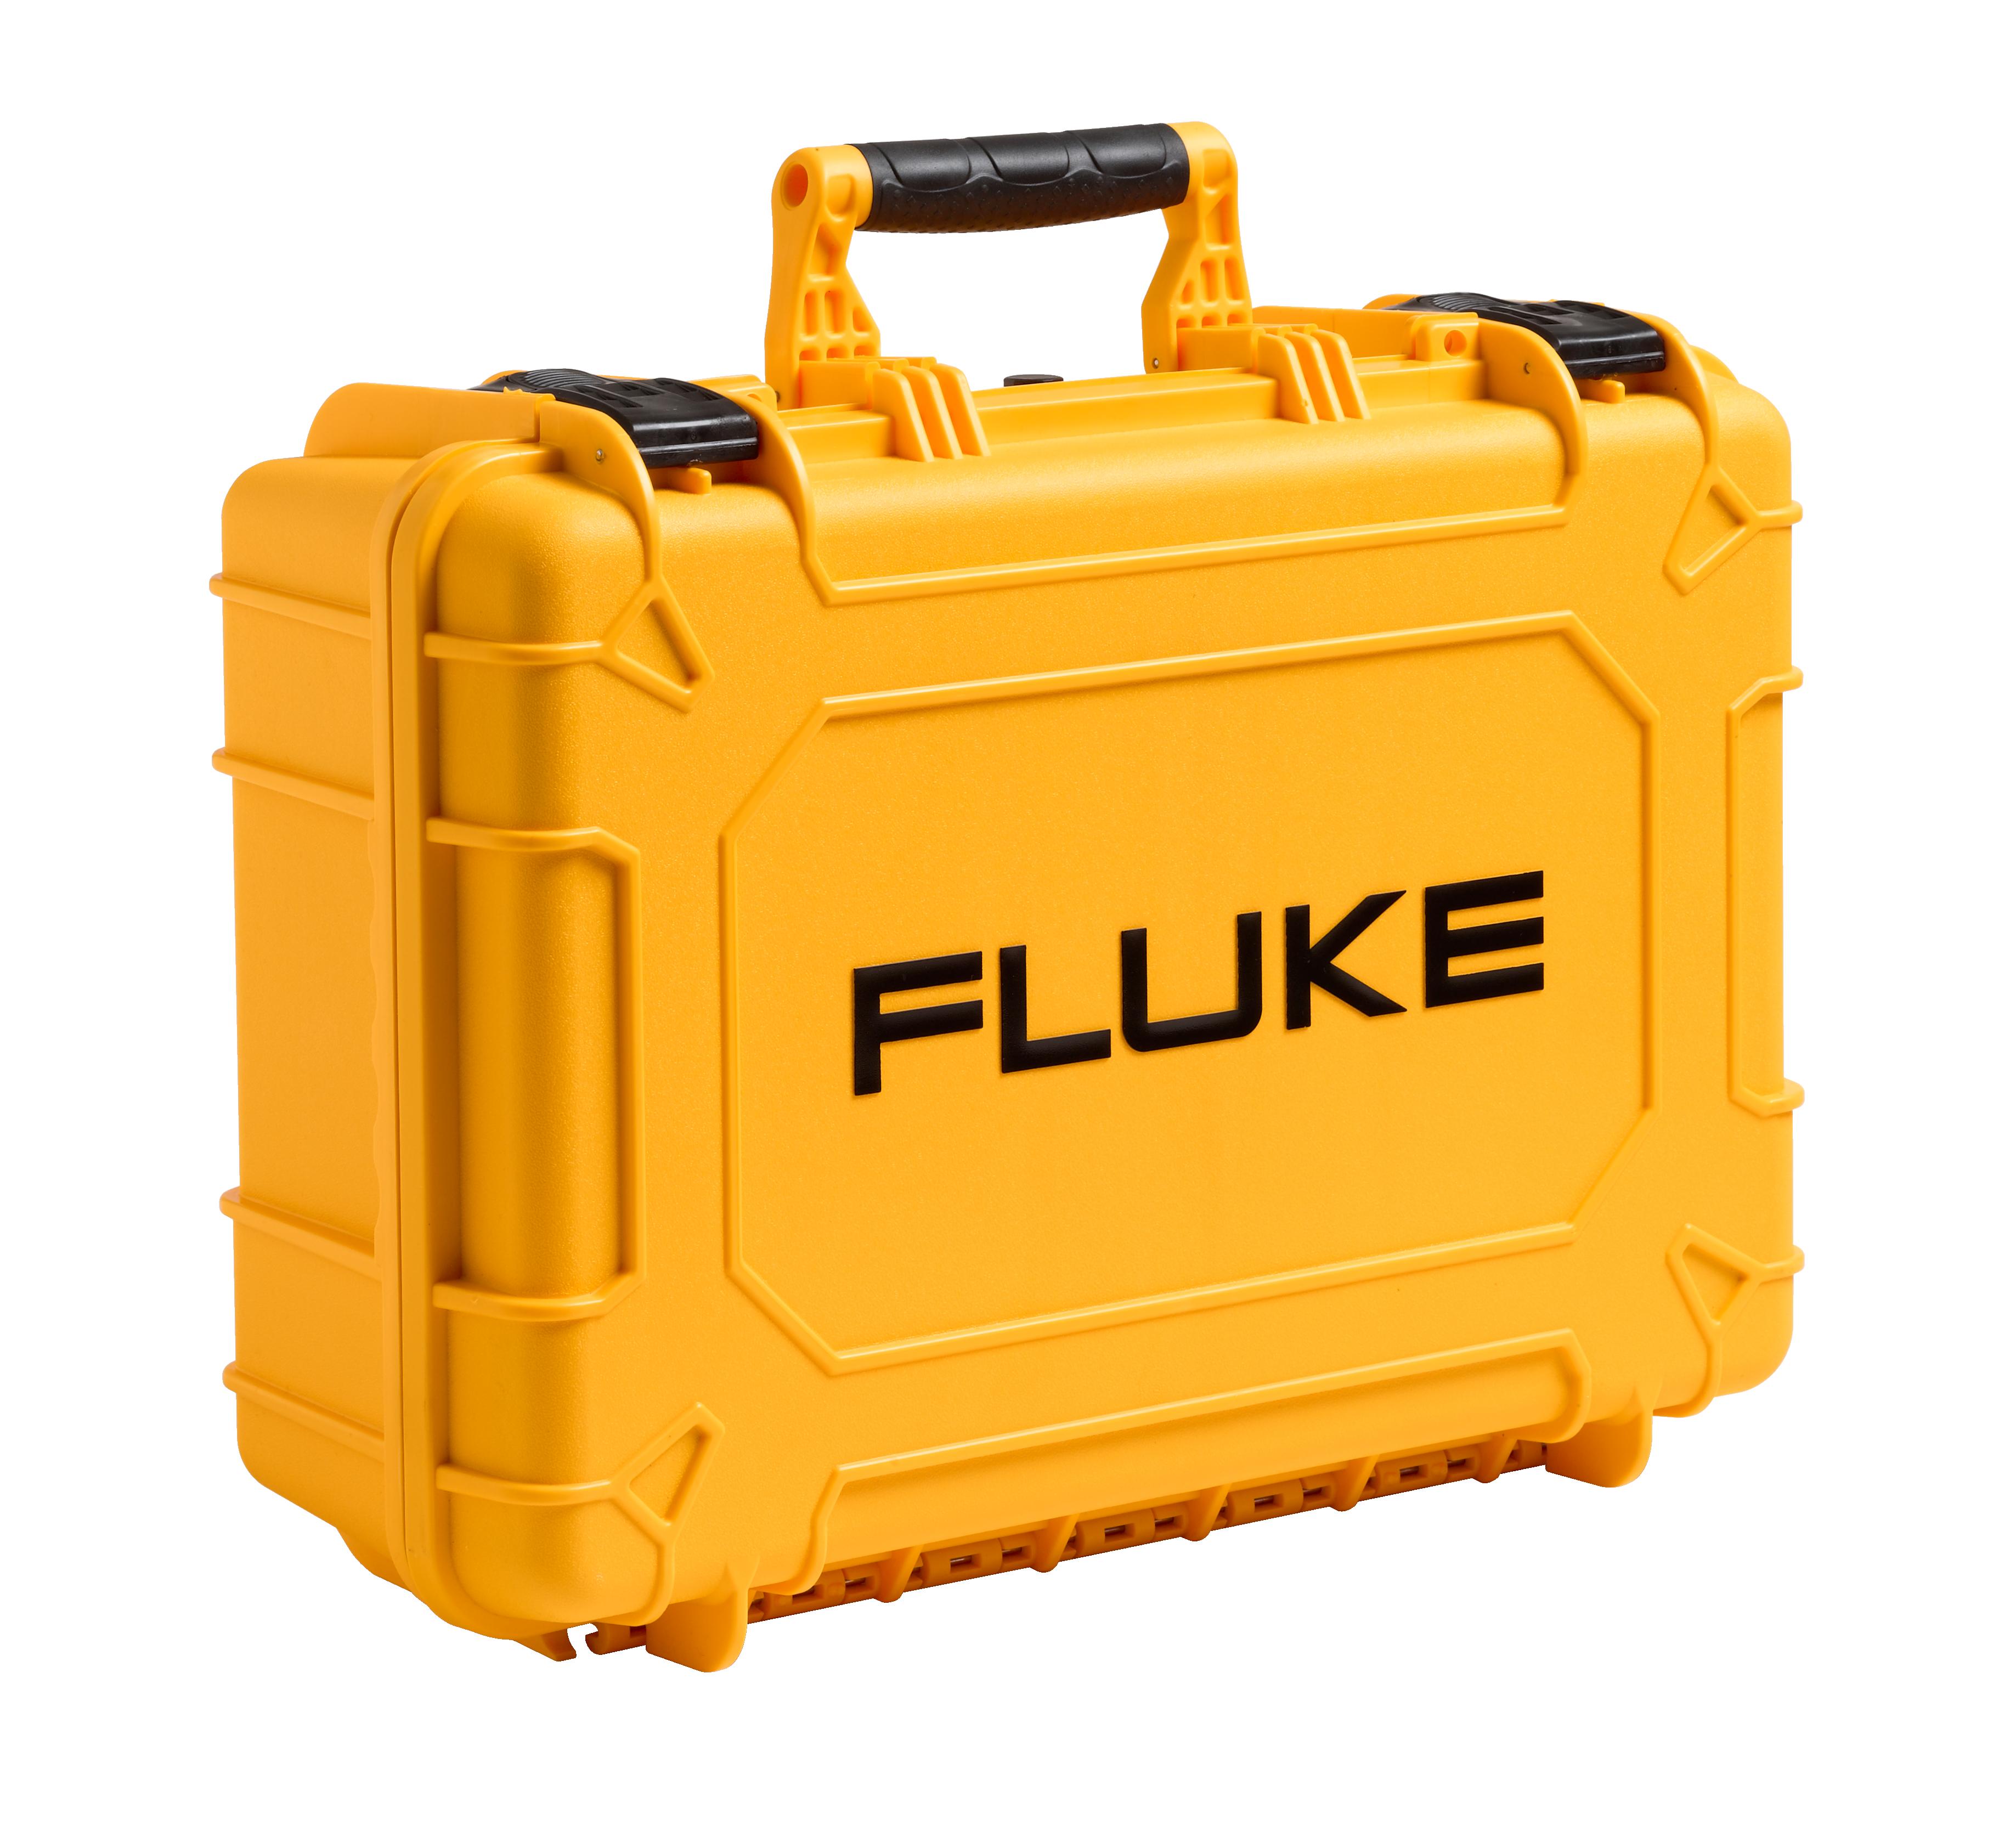 Fluke CXT1000 Extreme Hard Case w/DIY Foam Inserts